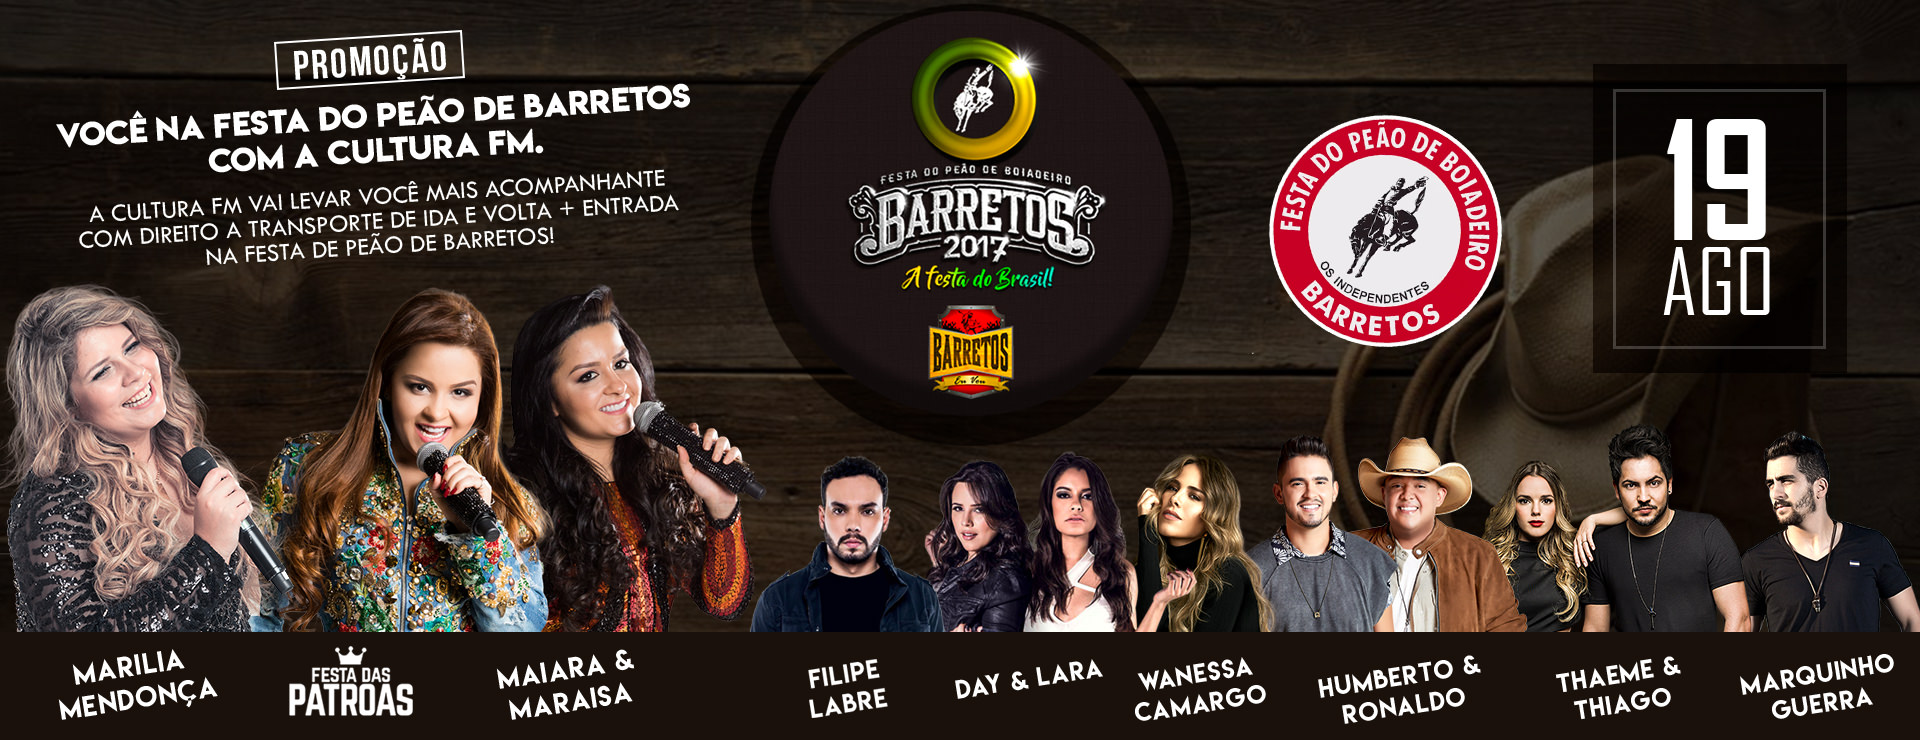 Barretos 2017